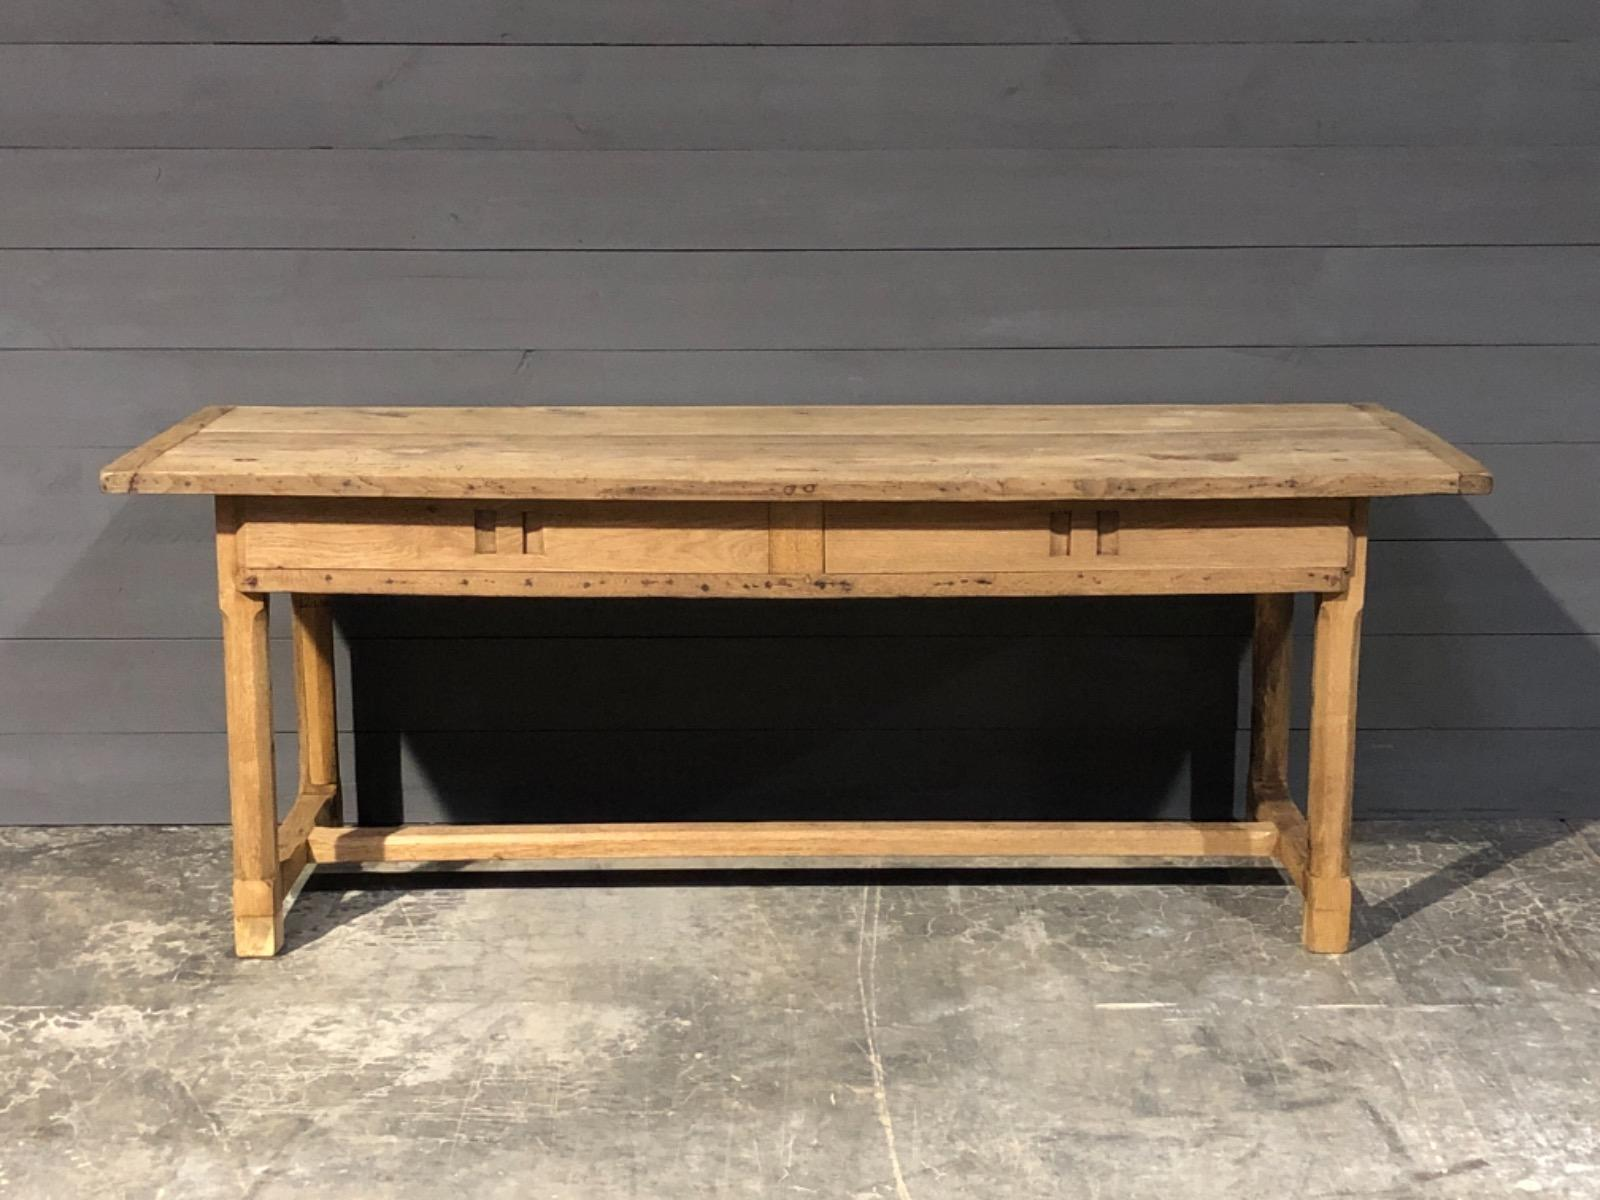 Antique Kitchen Work Table New Arrivals European Warehouse